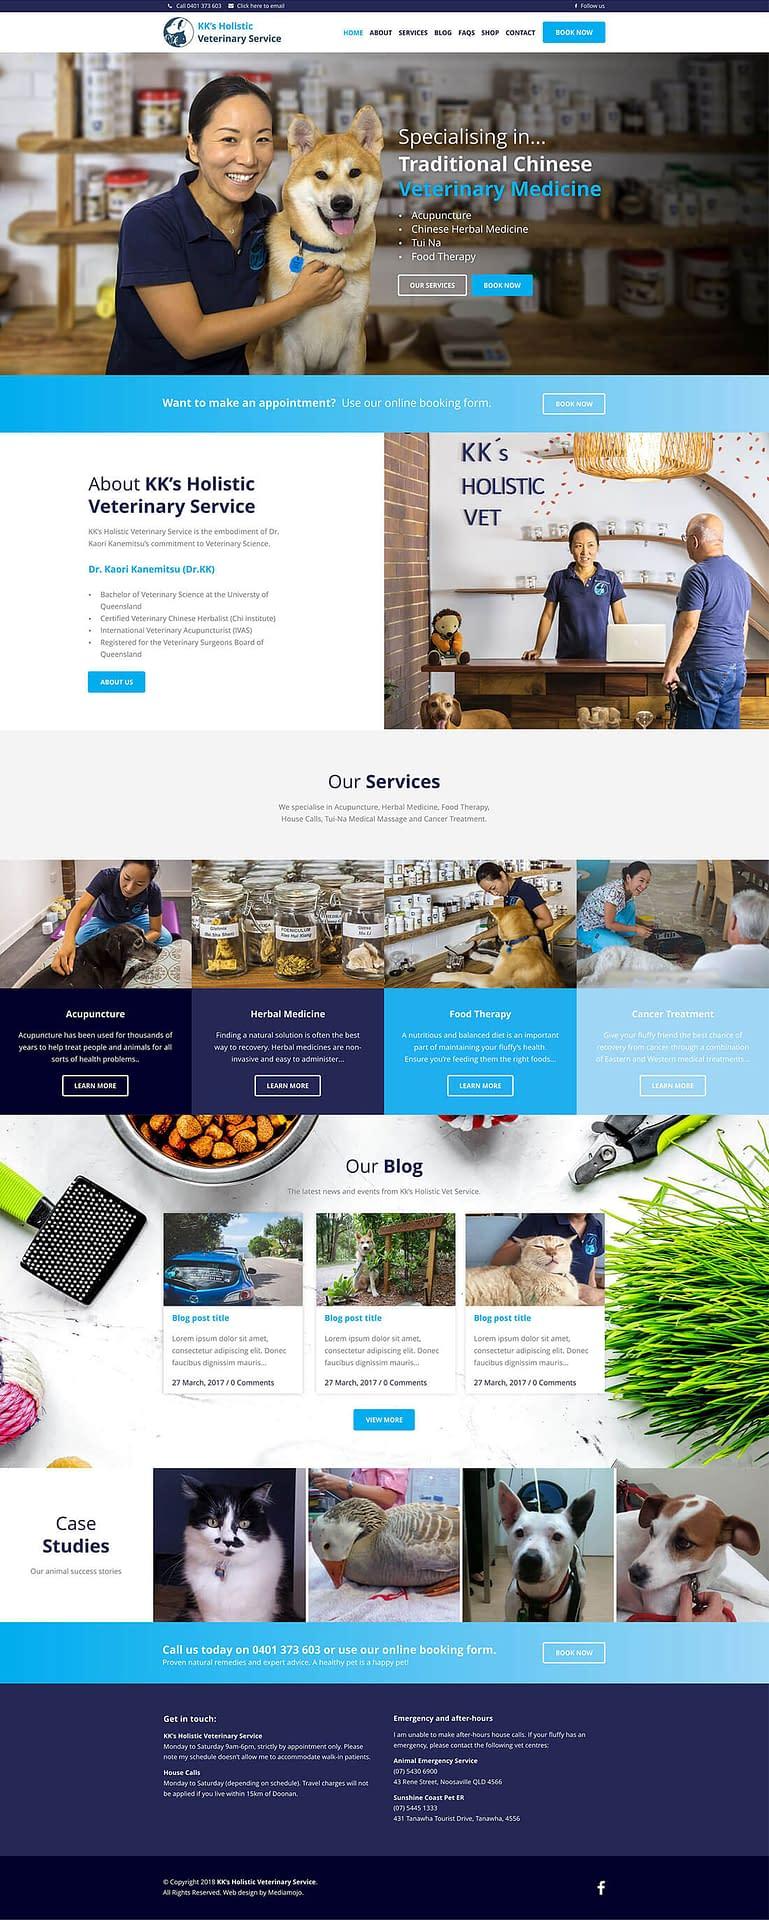 KK's Holistic Vet Service homepage